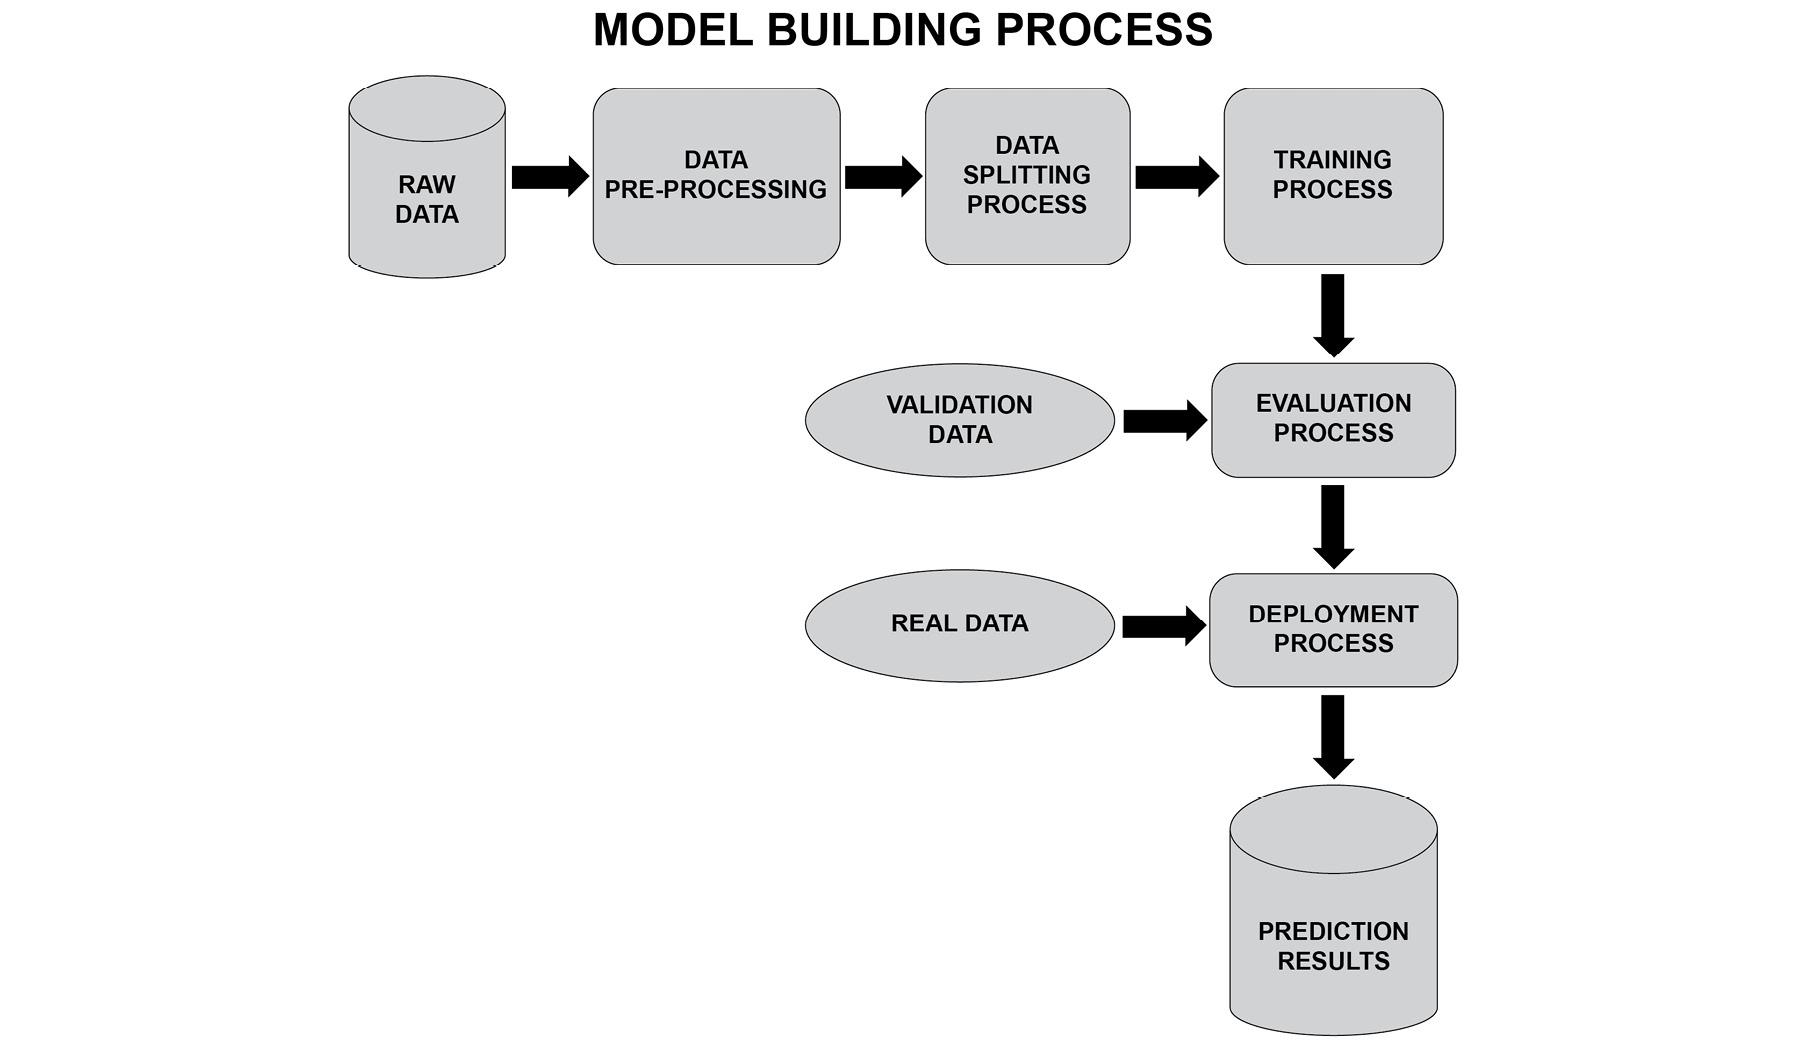 Figure 1.1: The model building process